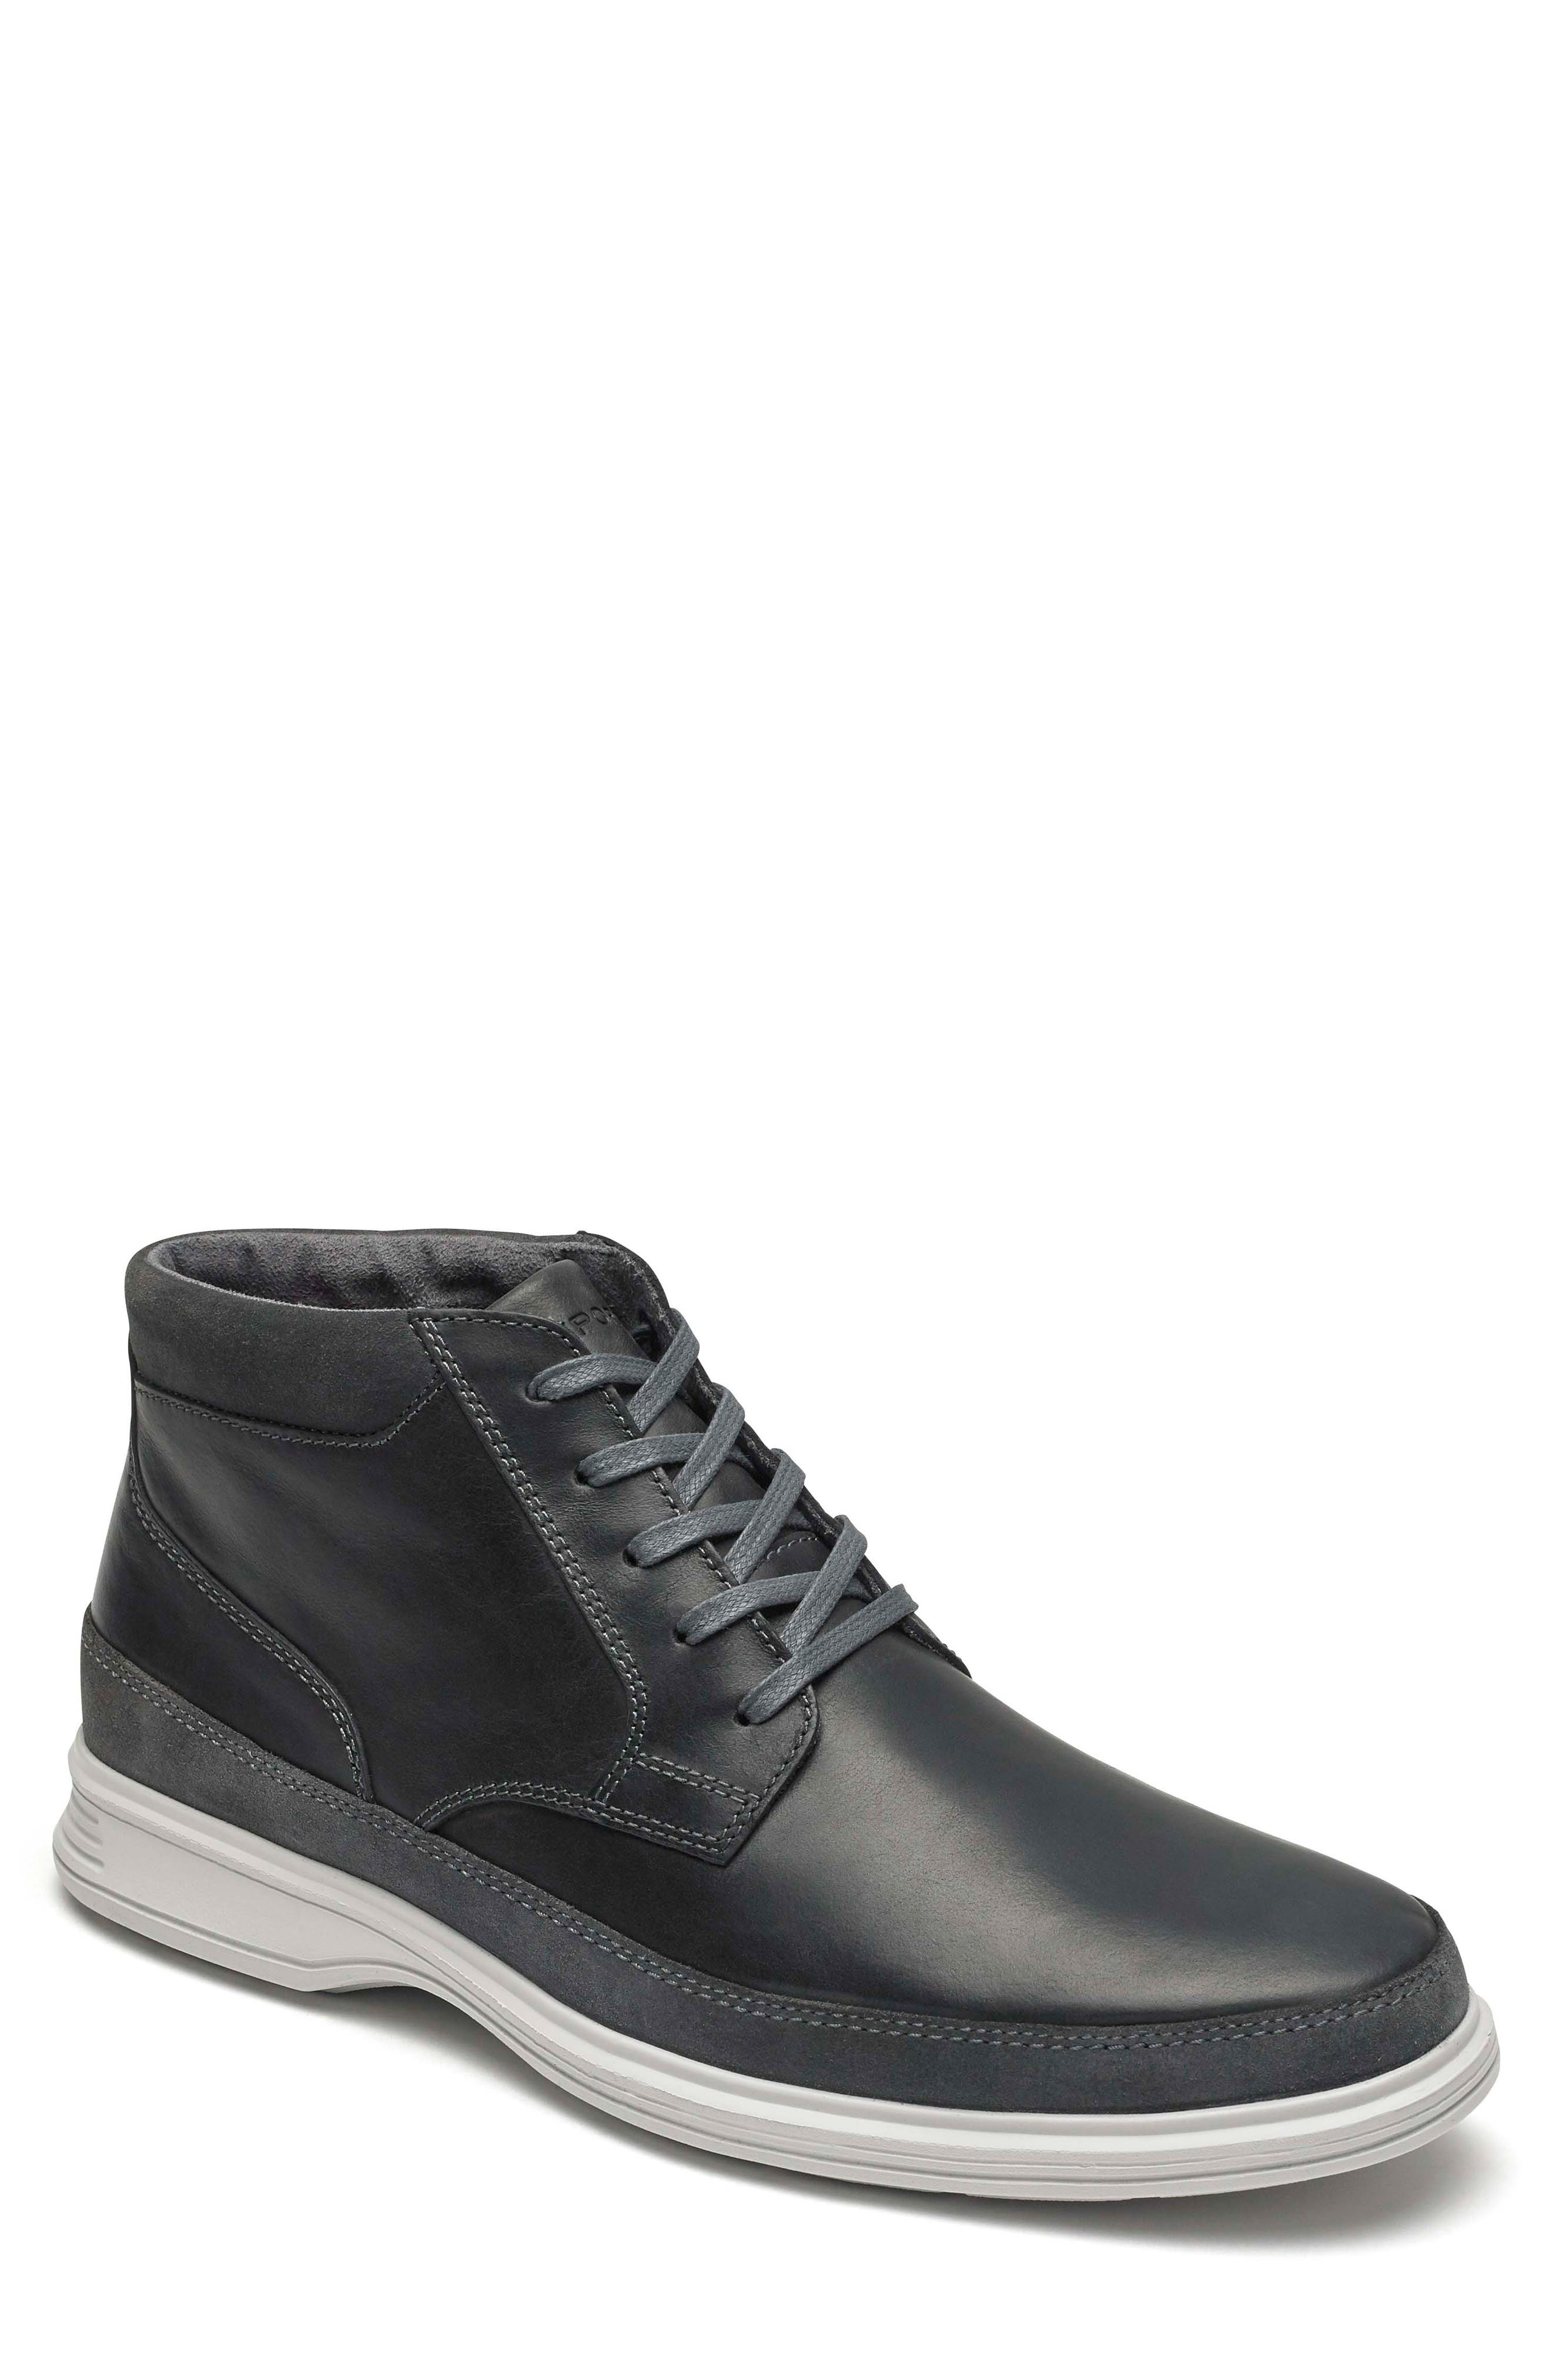 Rockport Dressports 2 Go Chukka Boot, Grey